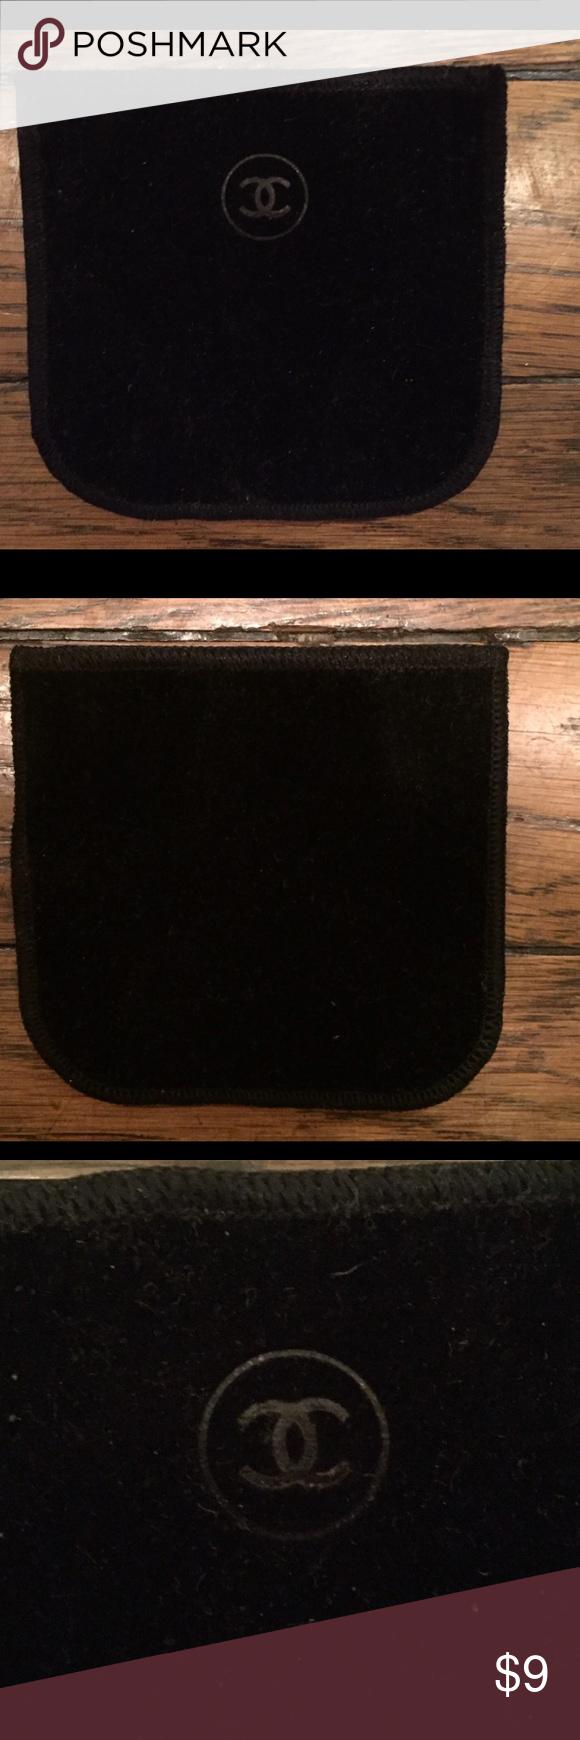 CHANEL Small Black Velvet Dust Pouch Bag Pouch bag